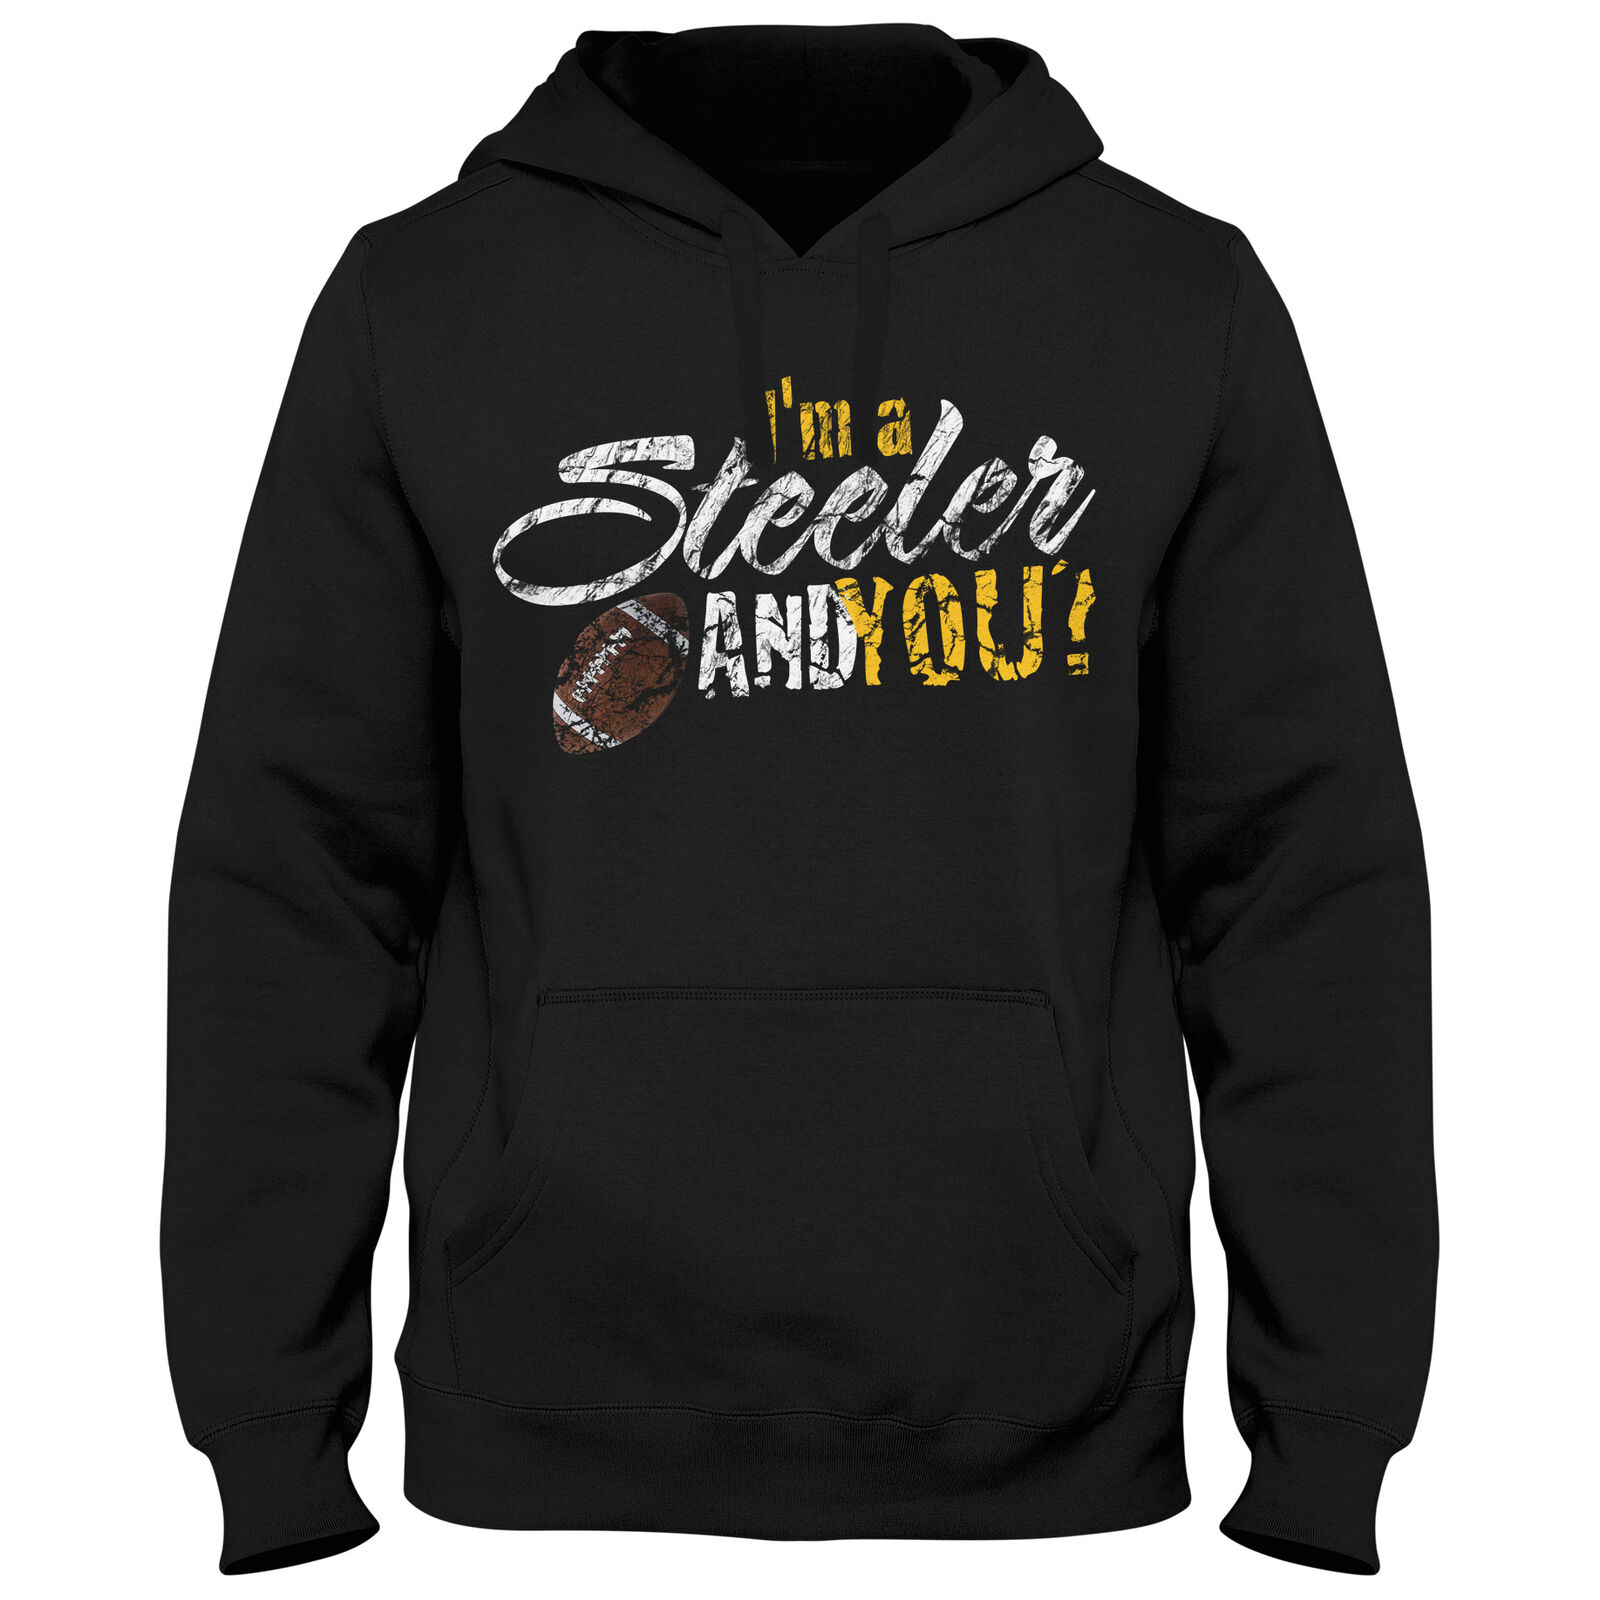 Hoody Hoodie Kapuzenpulli Football USA Steeler Bowl American Super Shirt DTG